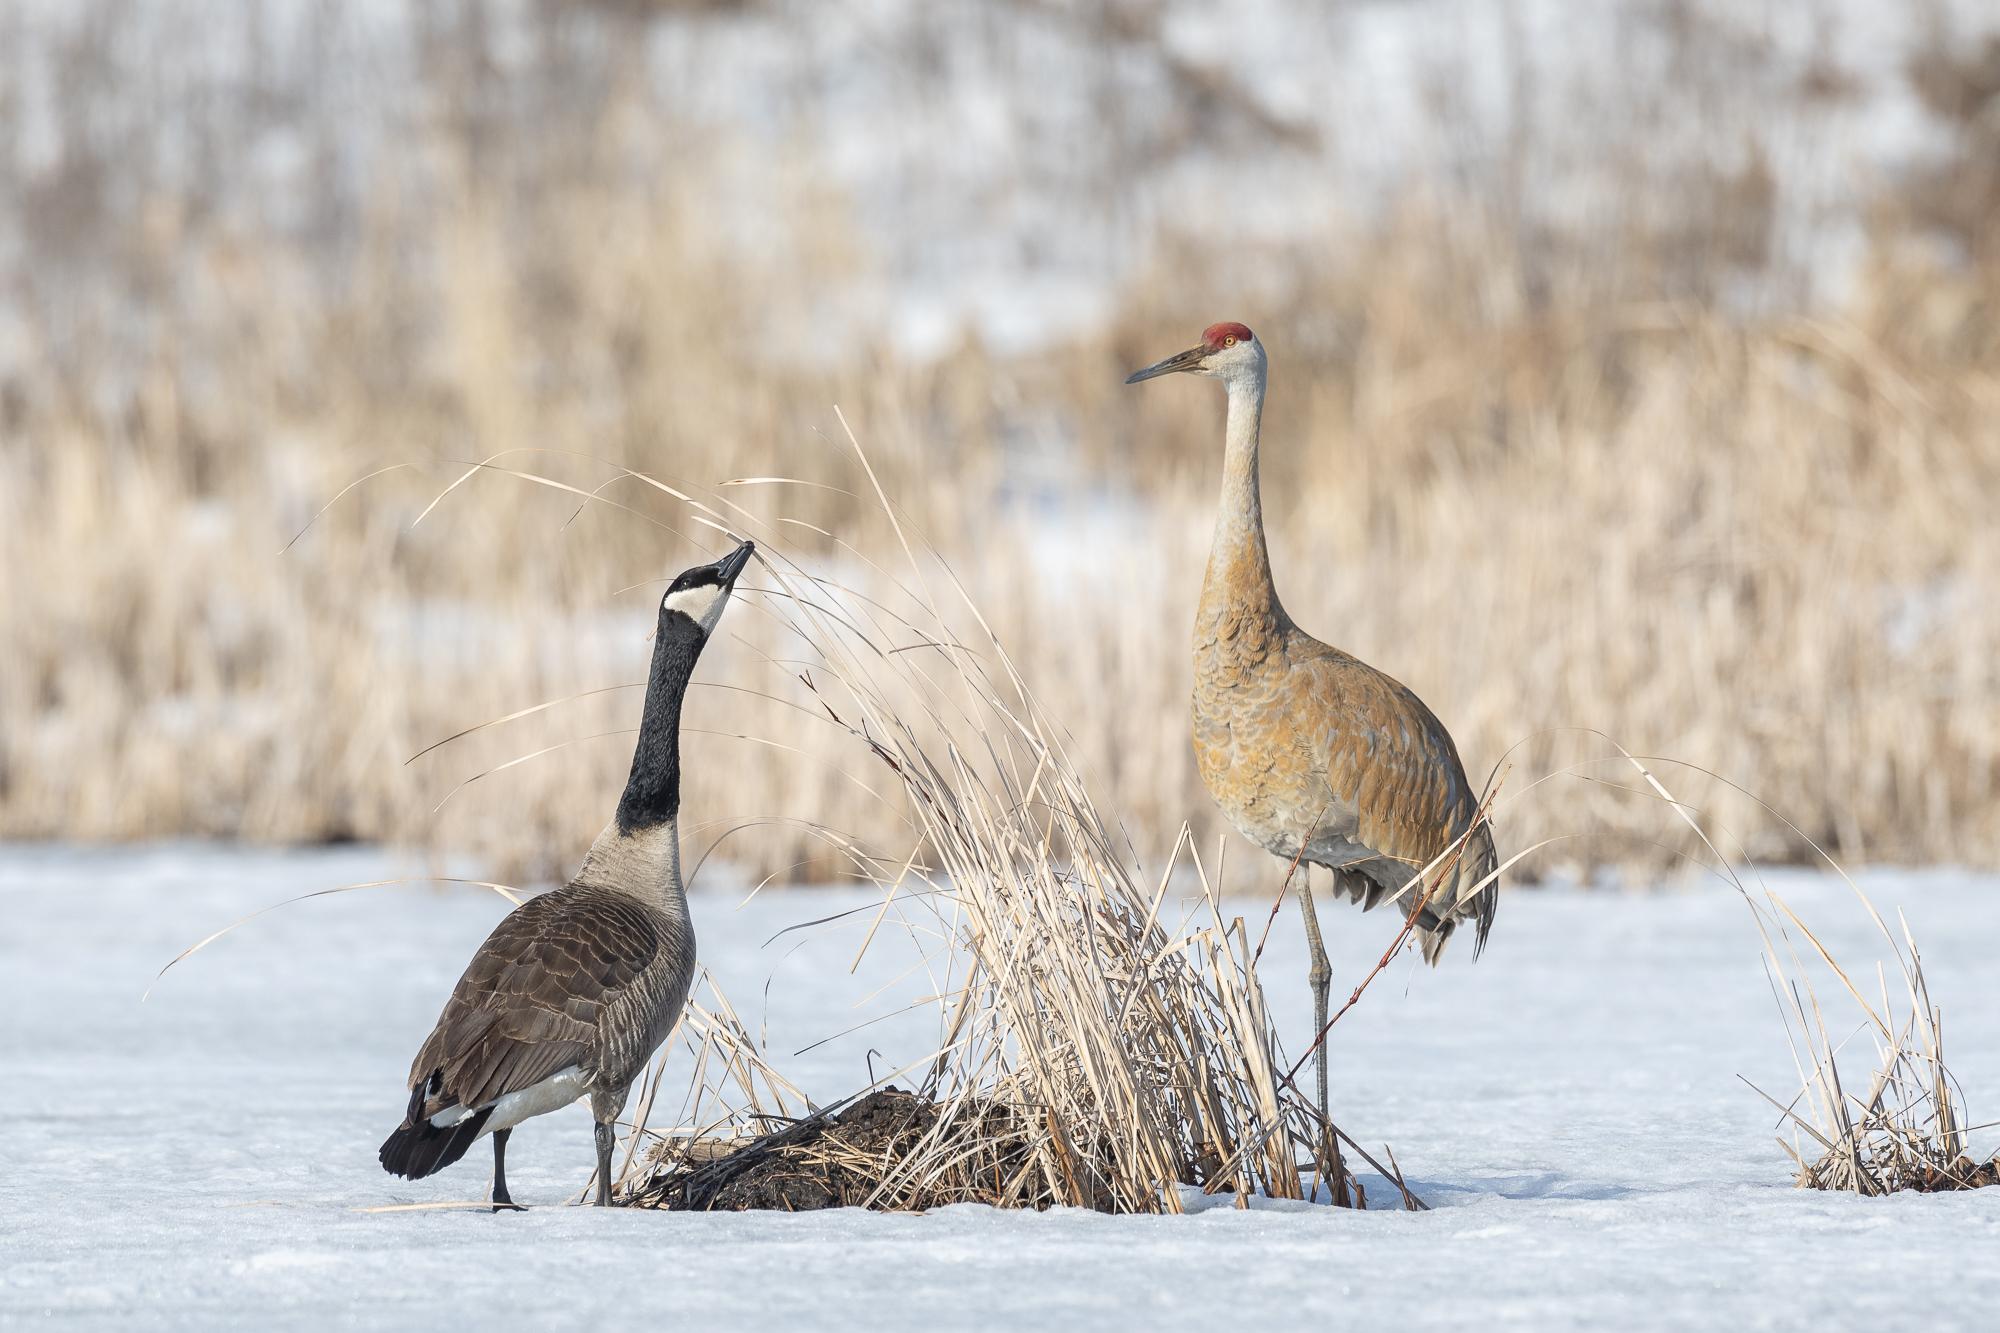 Canada goose and sandhill crane on frozen pond